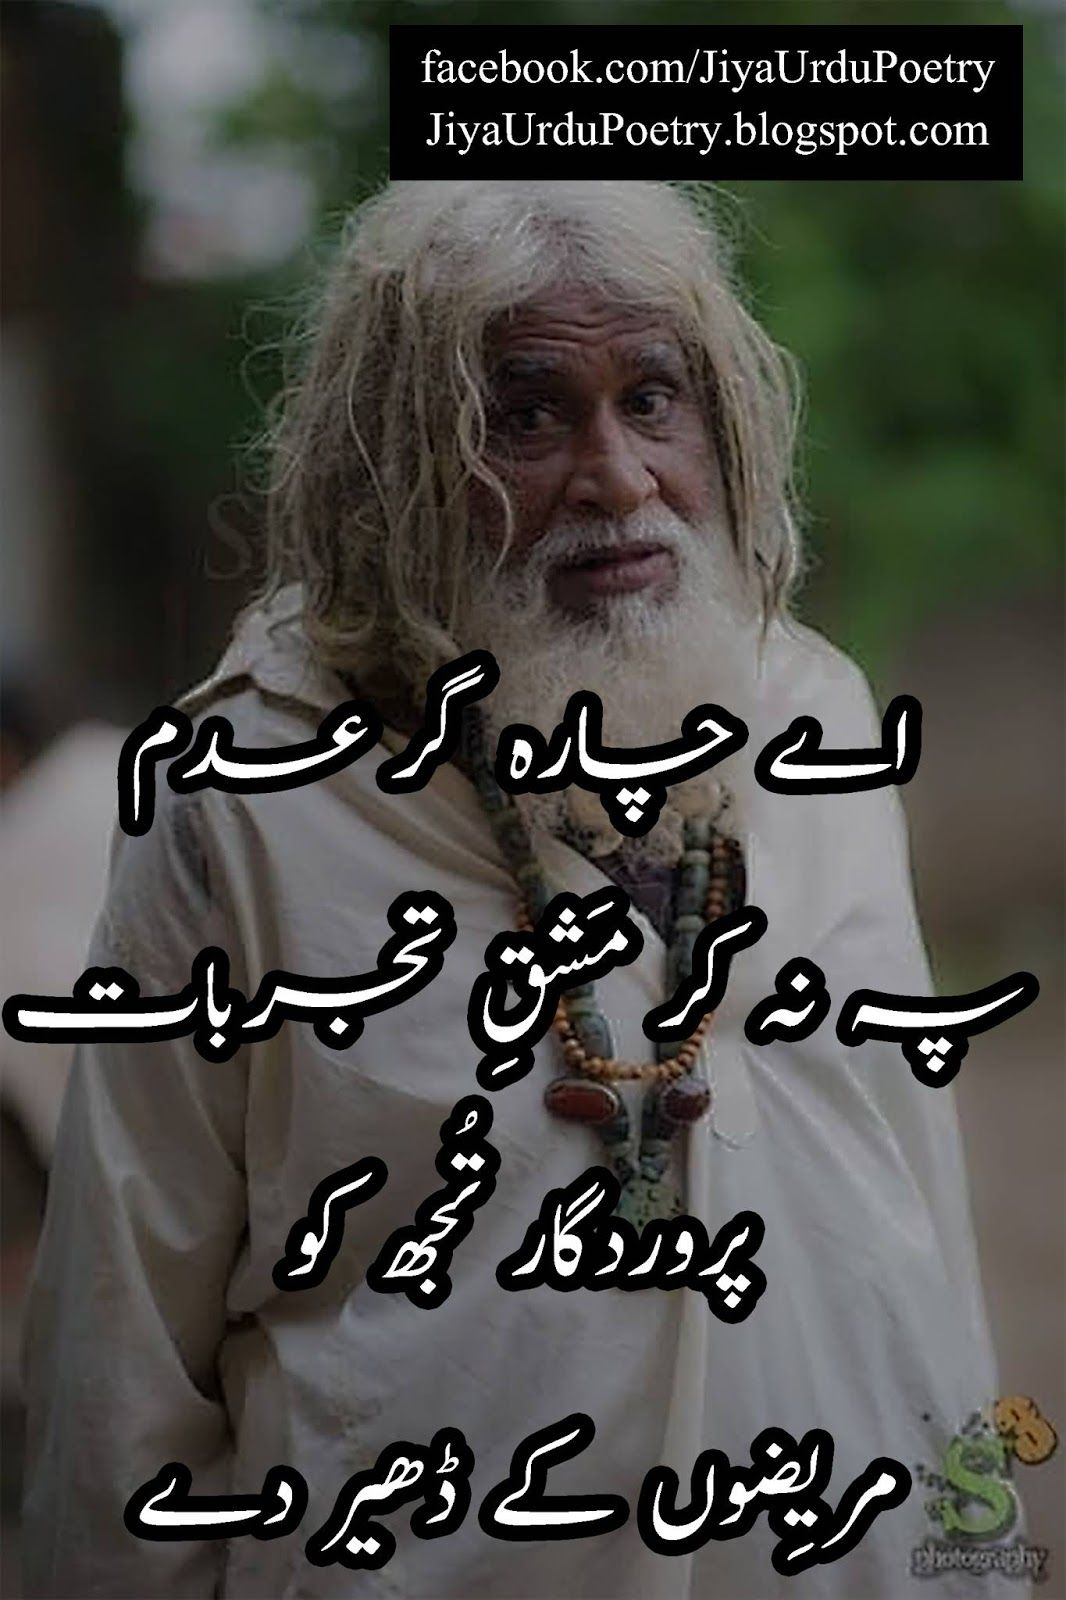 Sufi Poetry Shayari Quotes in Urdu | Sufi poetry, Sufi, Poetry